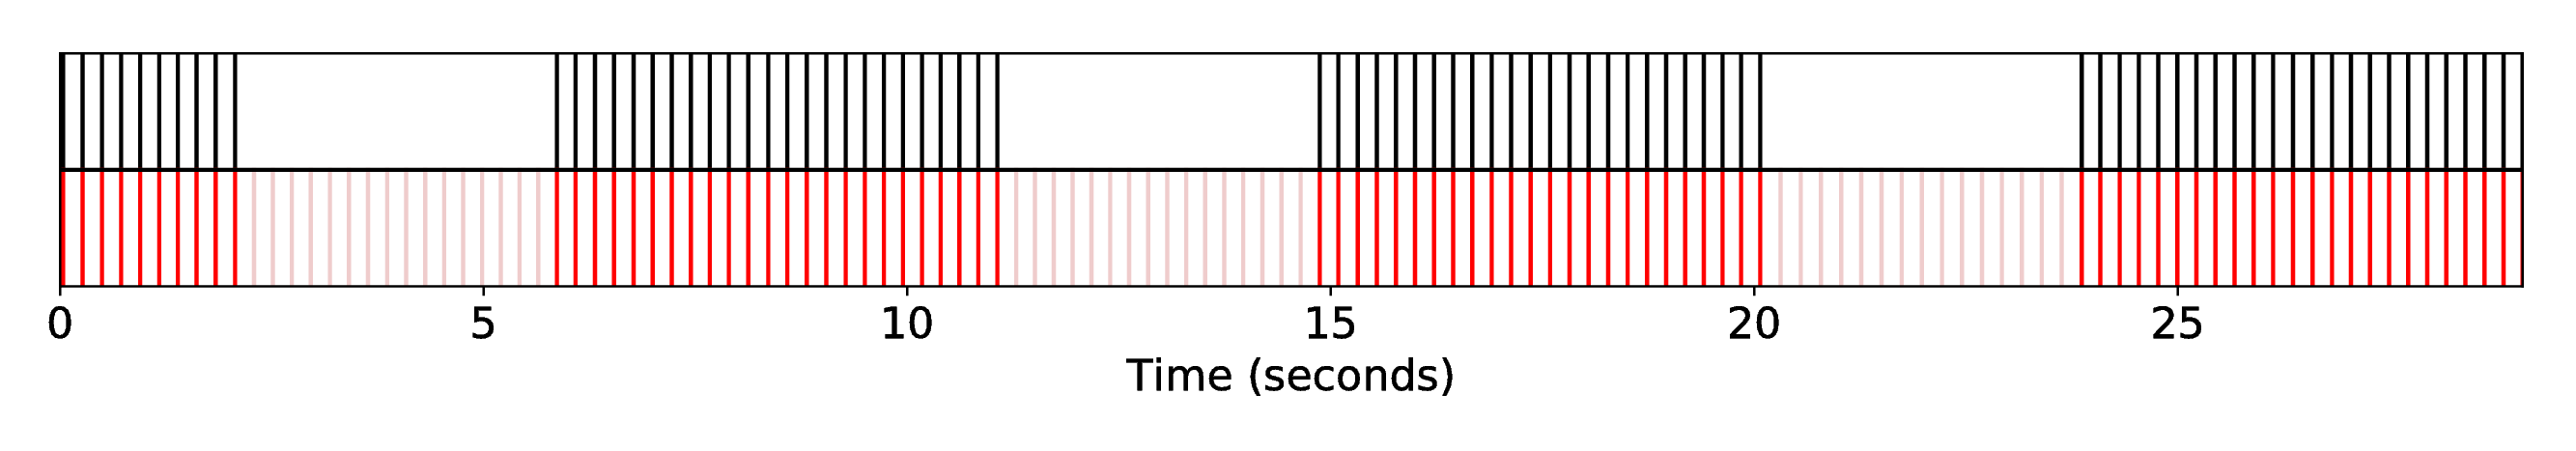 DP1_INT1_R-MRI-06__S-Fandango__SequenceAlignment